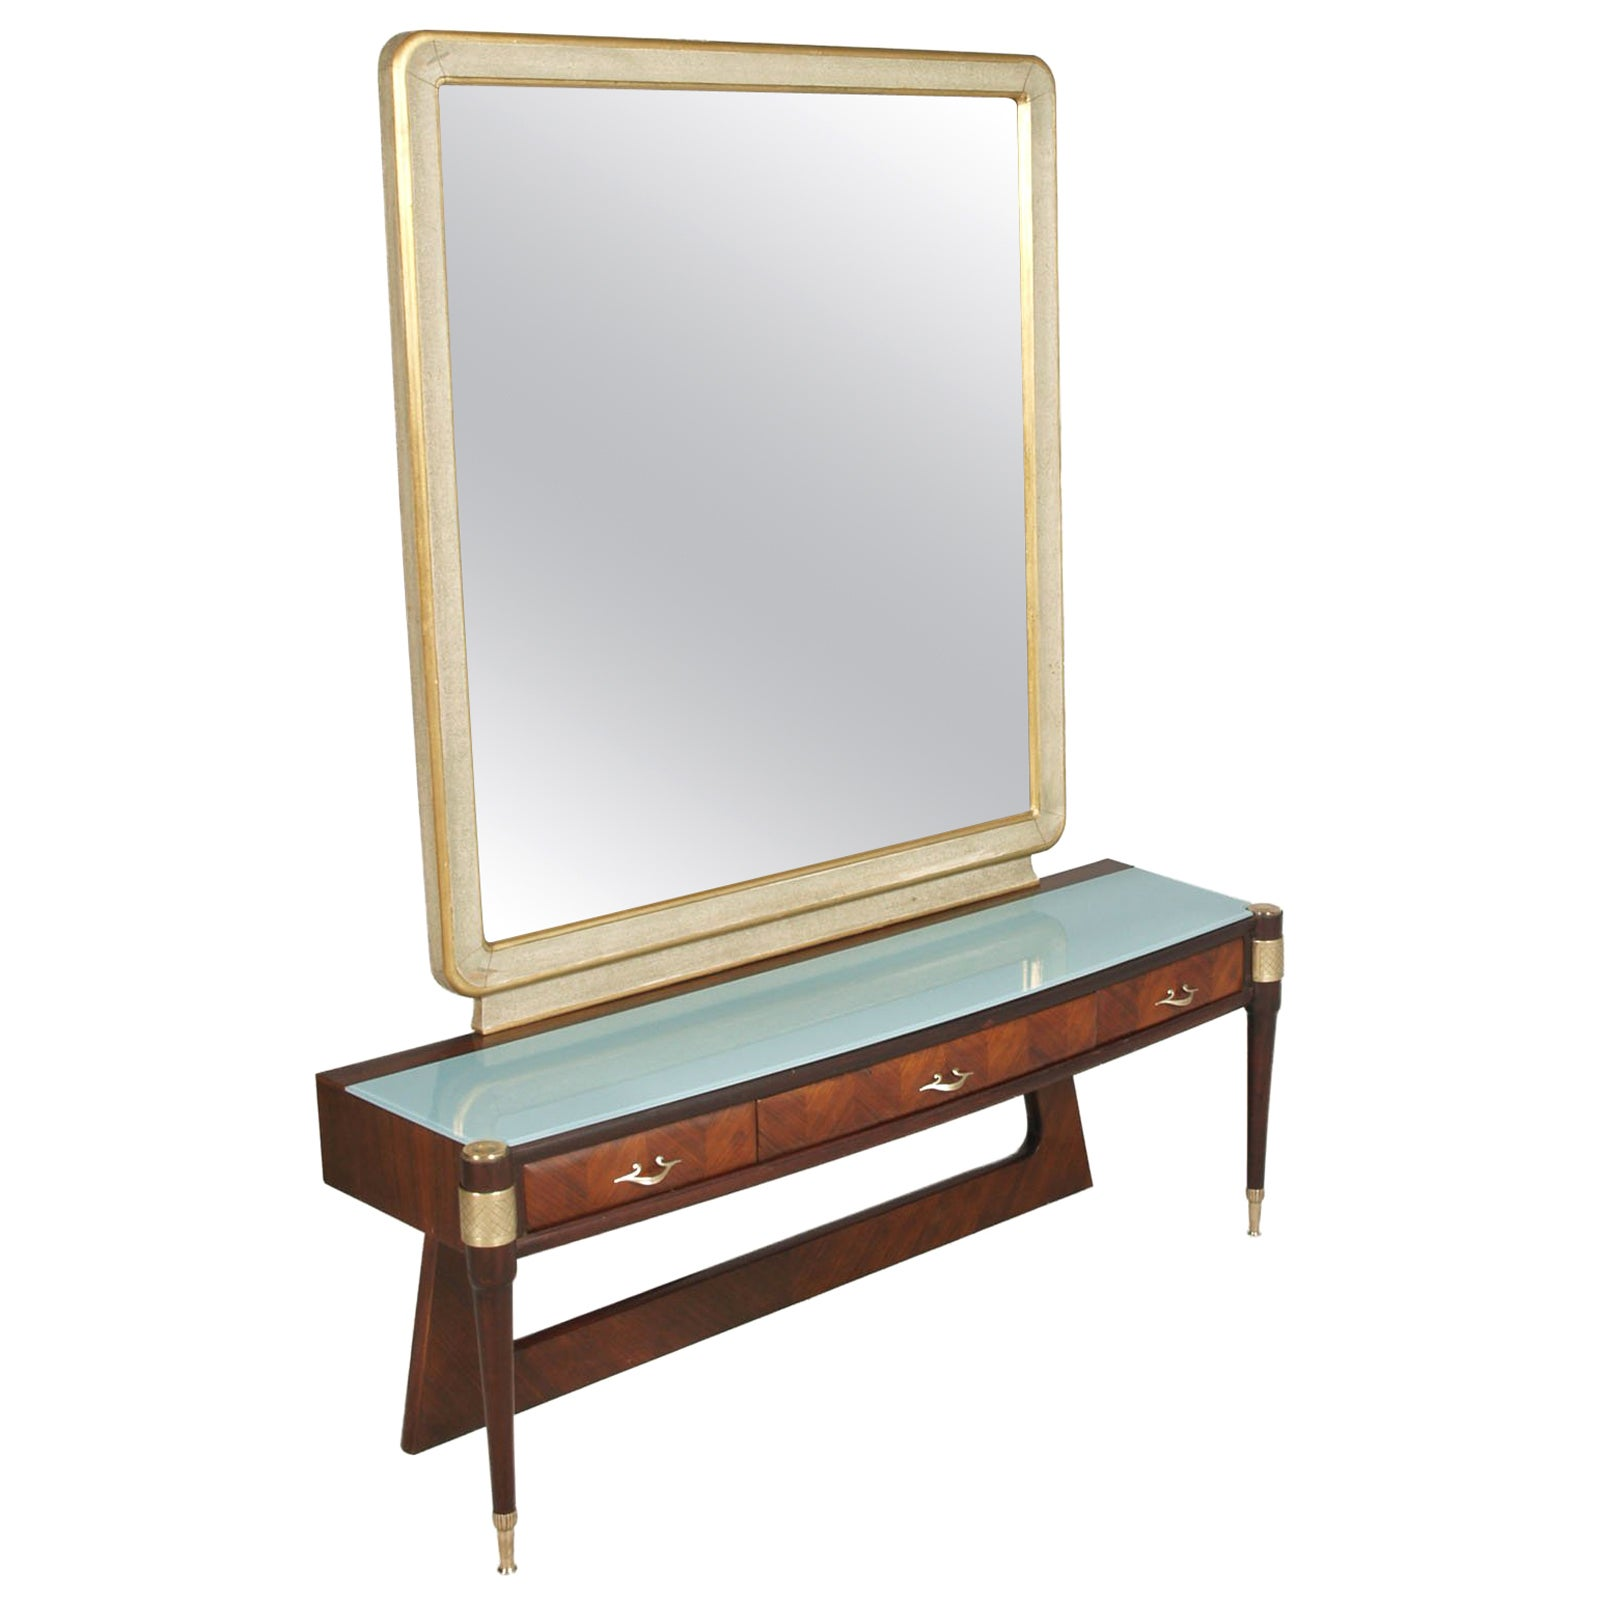 Mid-Century Modern Pier Luigi Colli Mirrored Console, Vanity, Italy, from Cantu